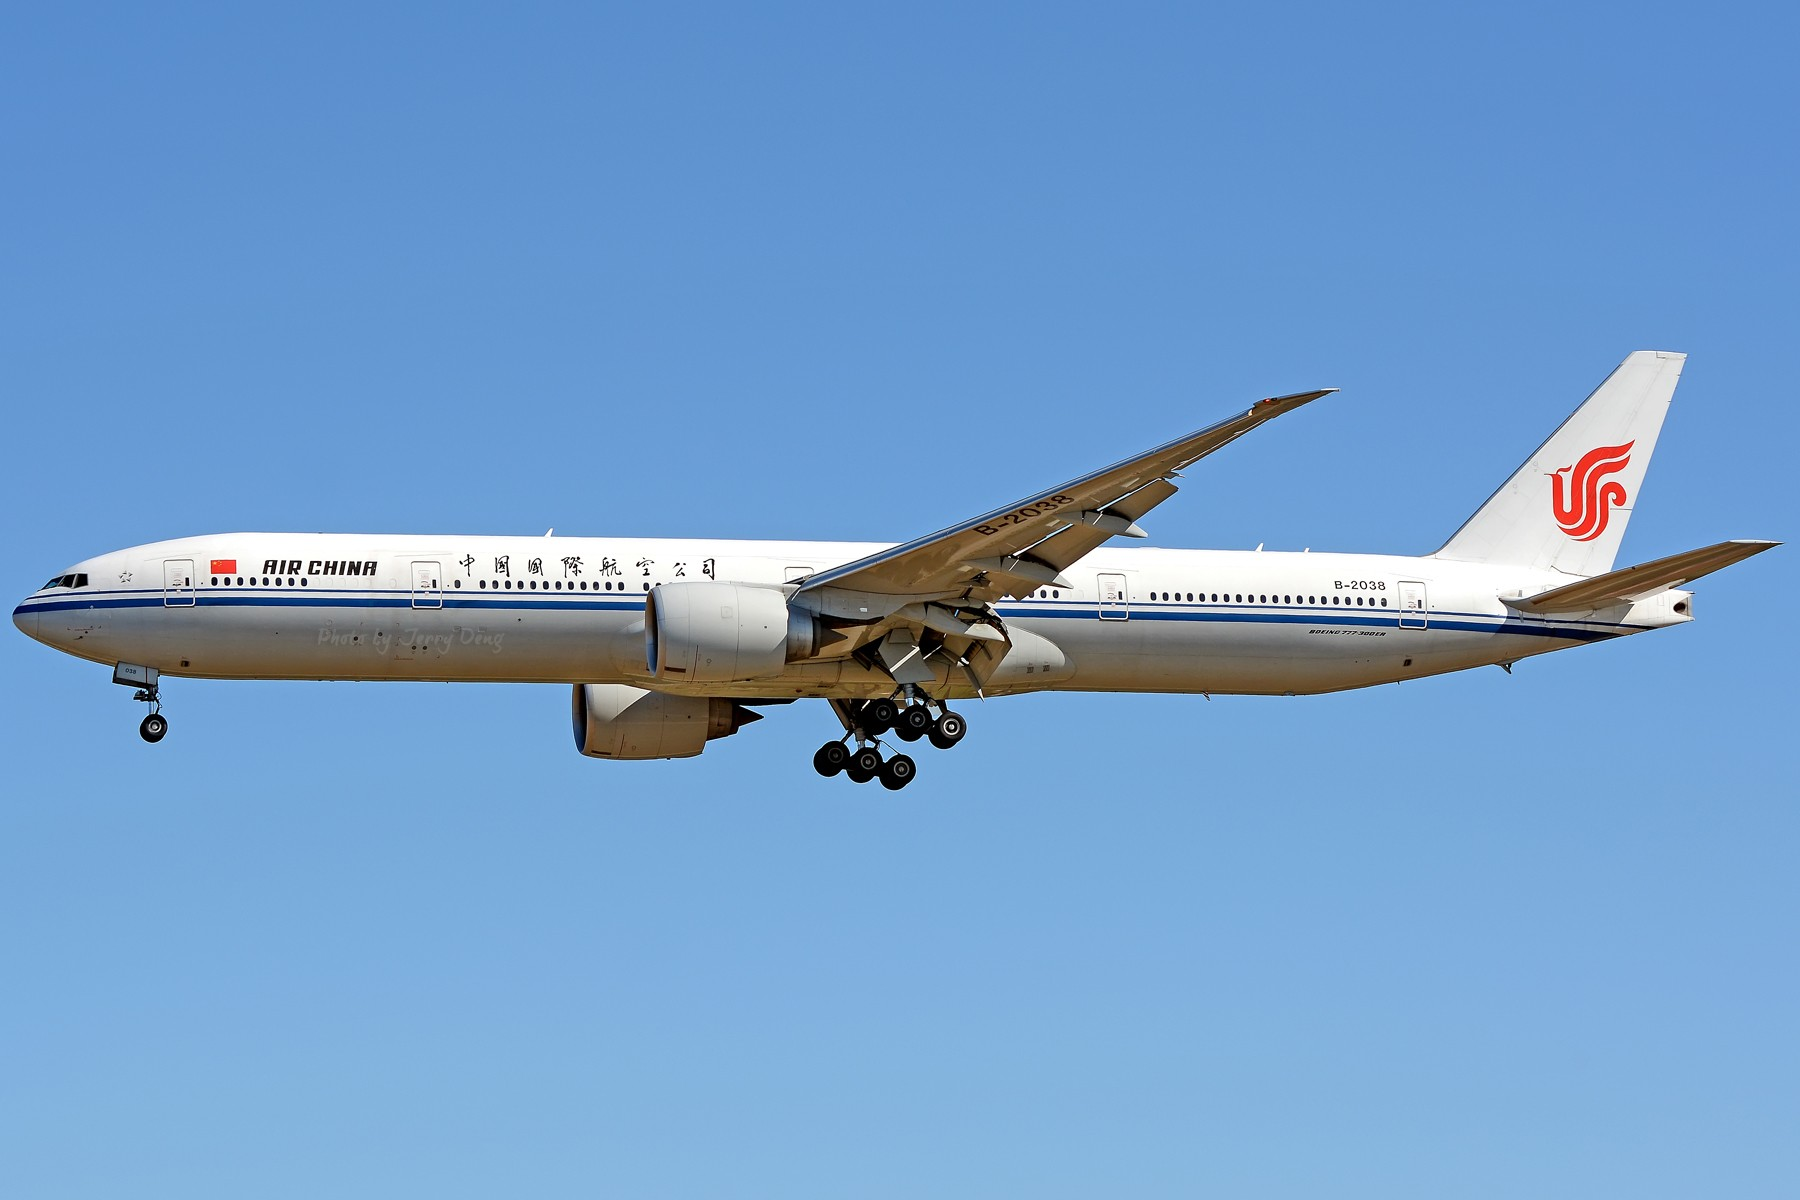 Re:[原创]【多图党】PEK落地一组国航系【2】 BOEING 777-300ER B-2038 中国北京首都国际机场